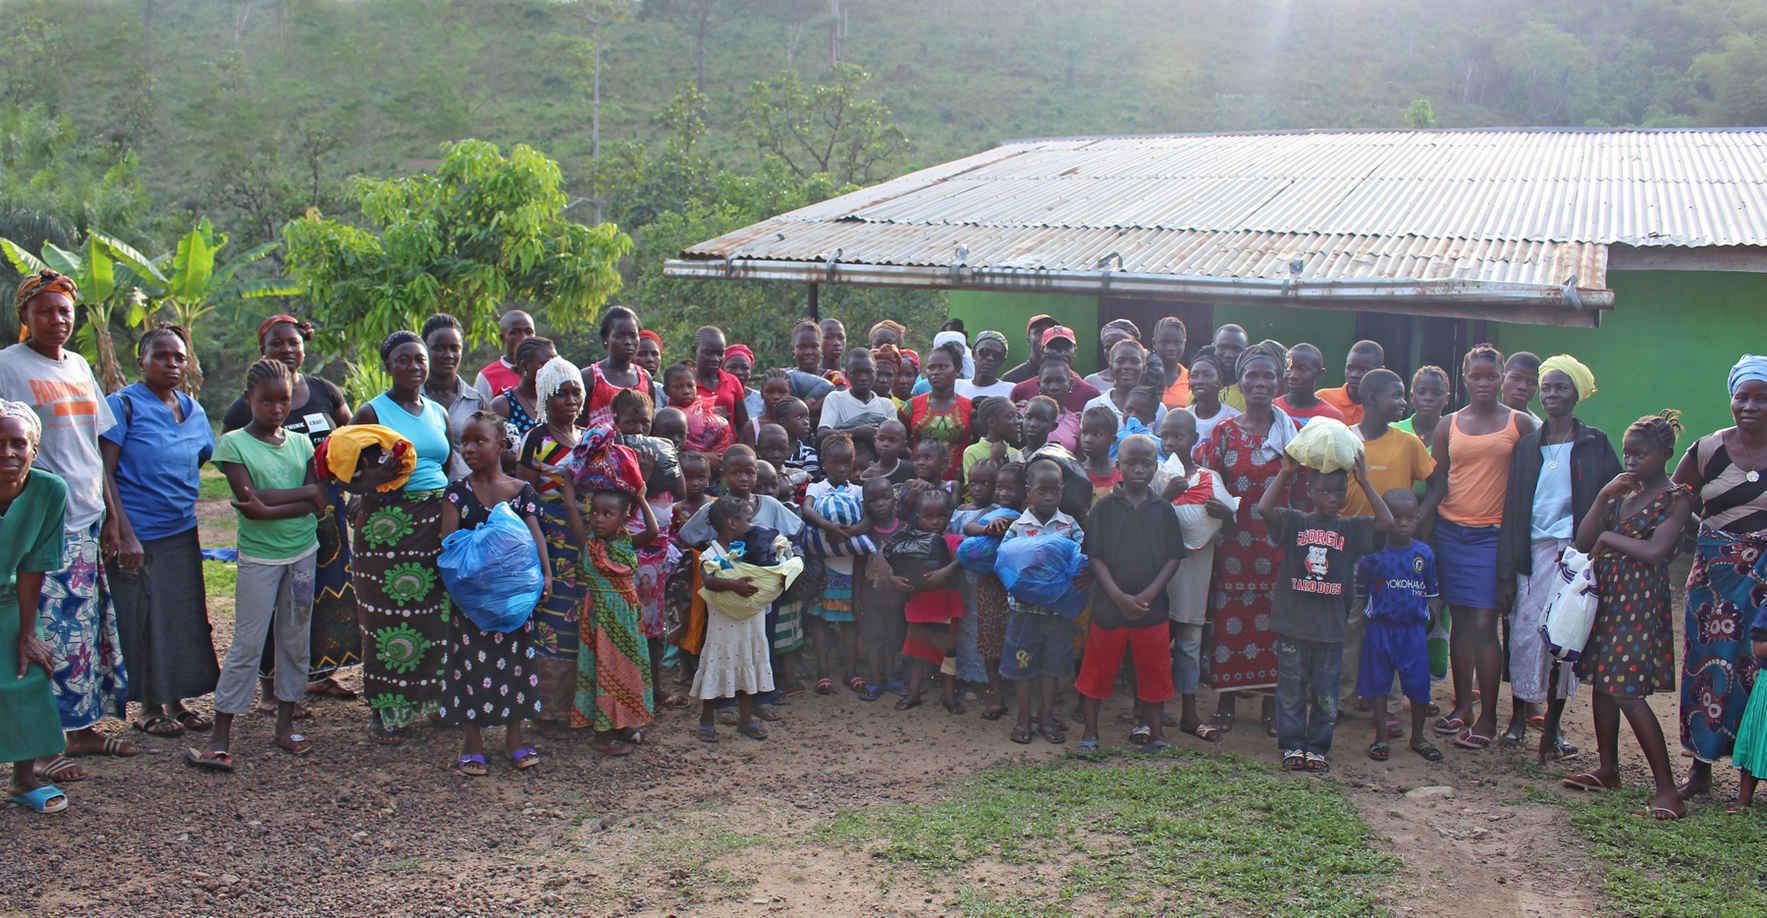 RESTORE HOPE: LIBERIA image